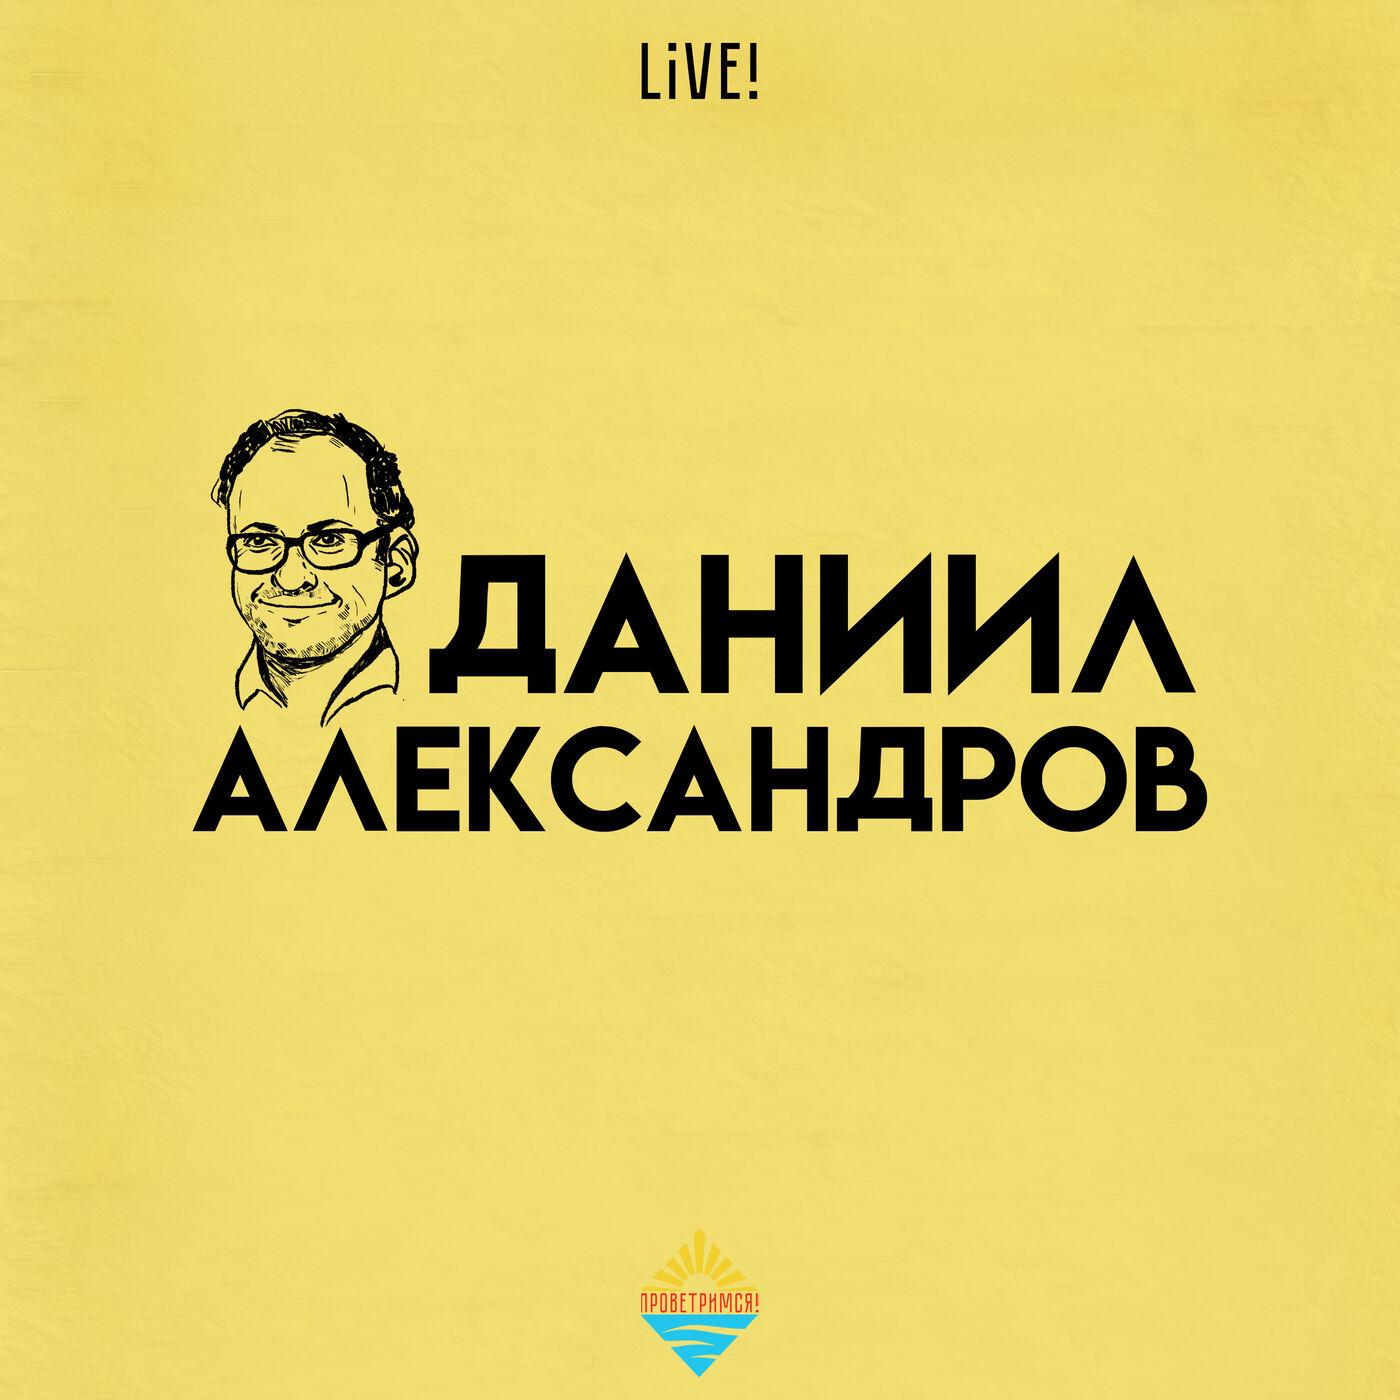 Даниил Александров live!